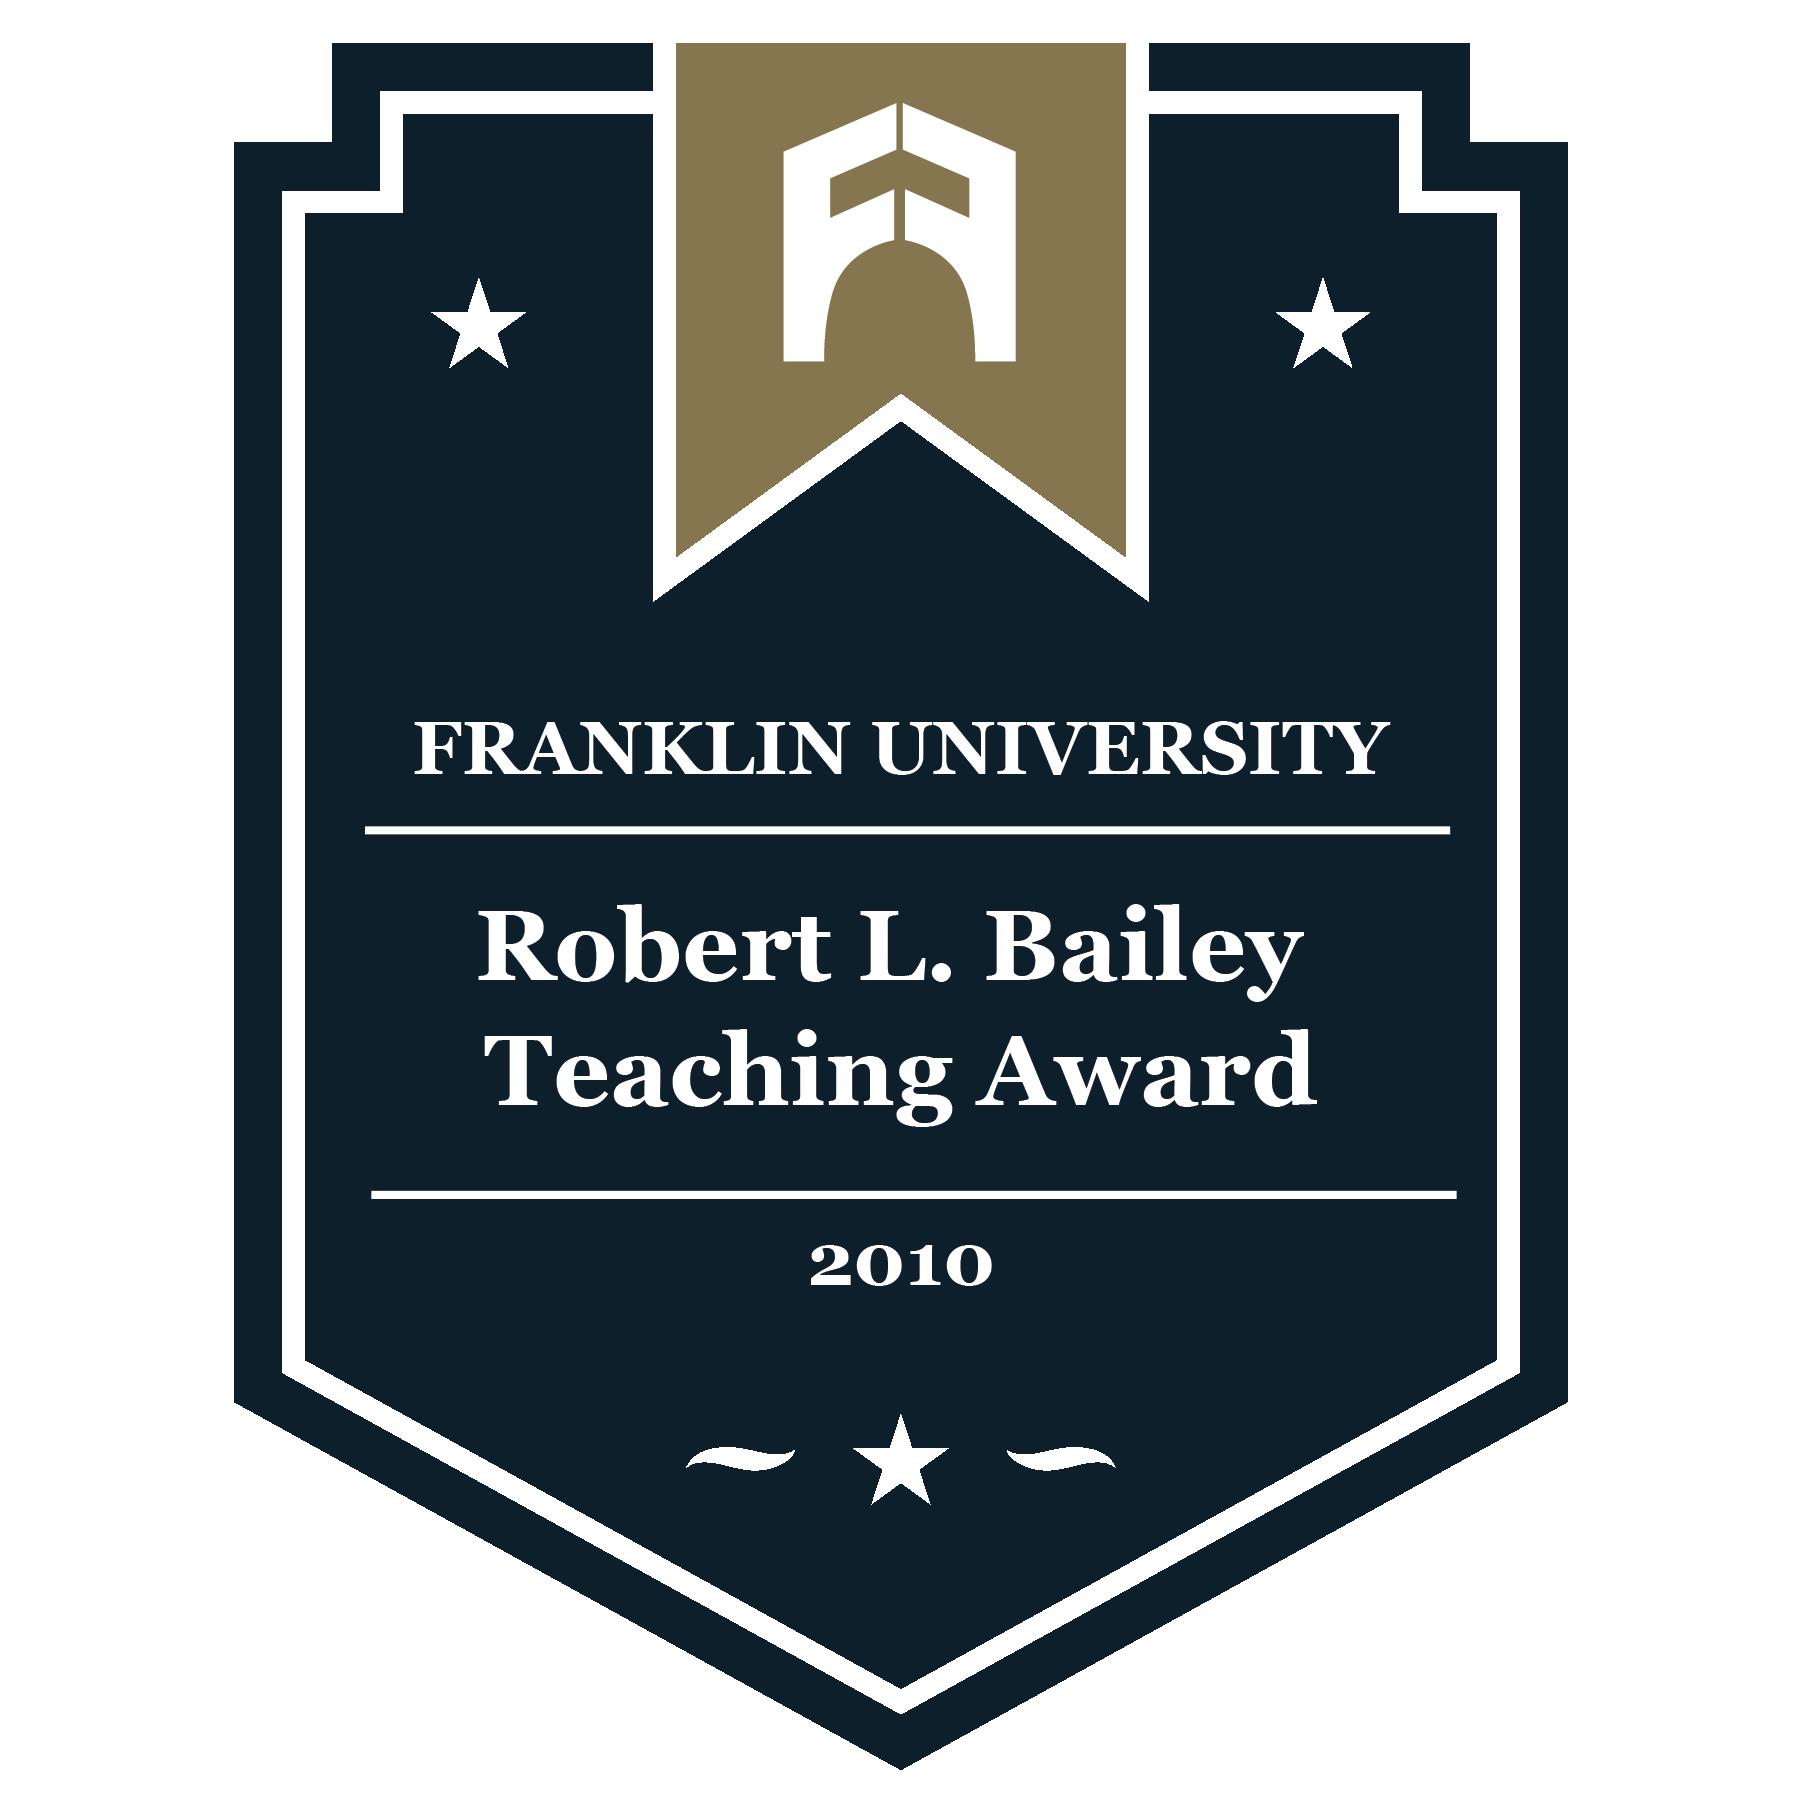 2010 Robert L. Bailey Teaching Award